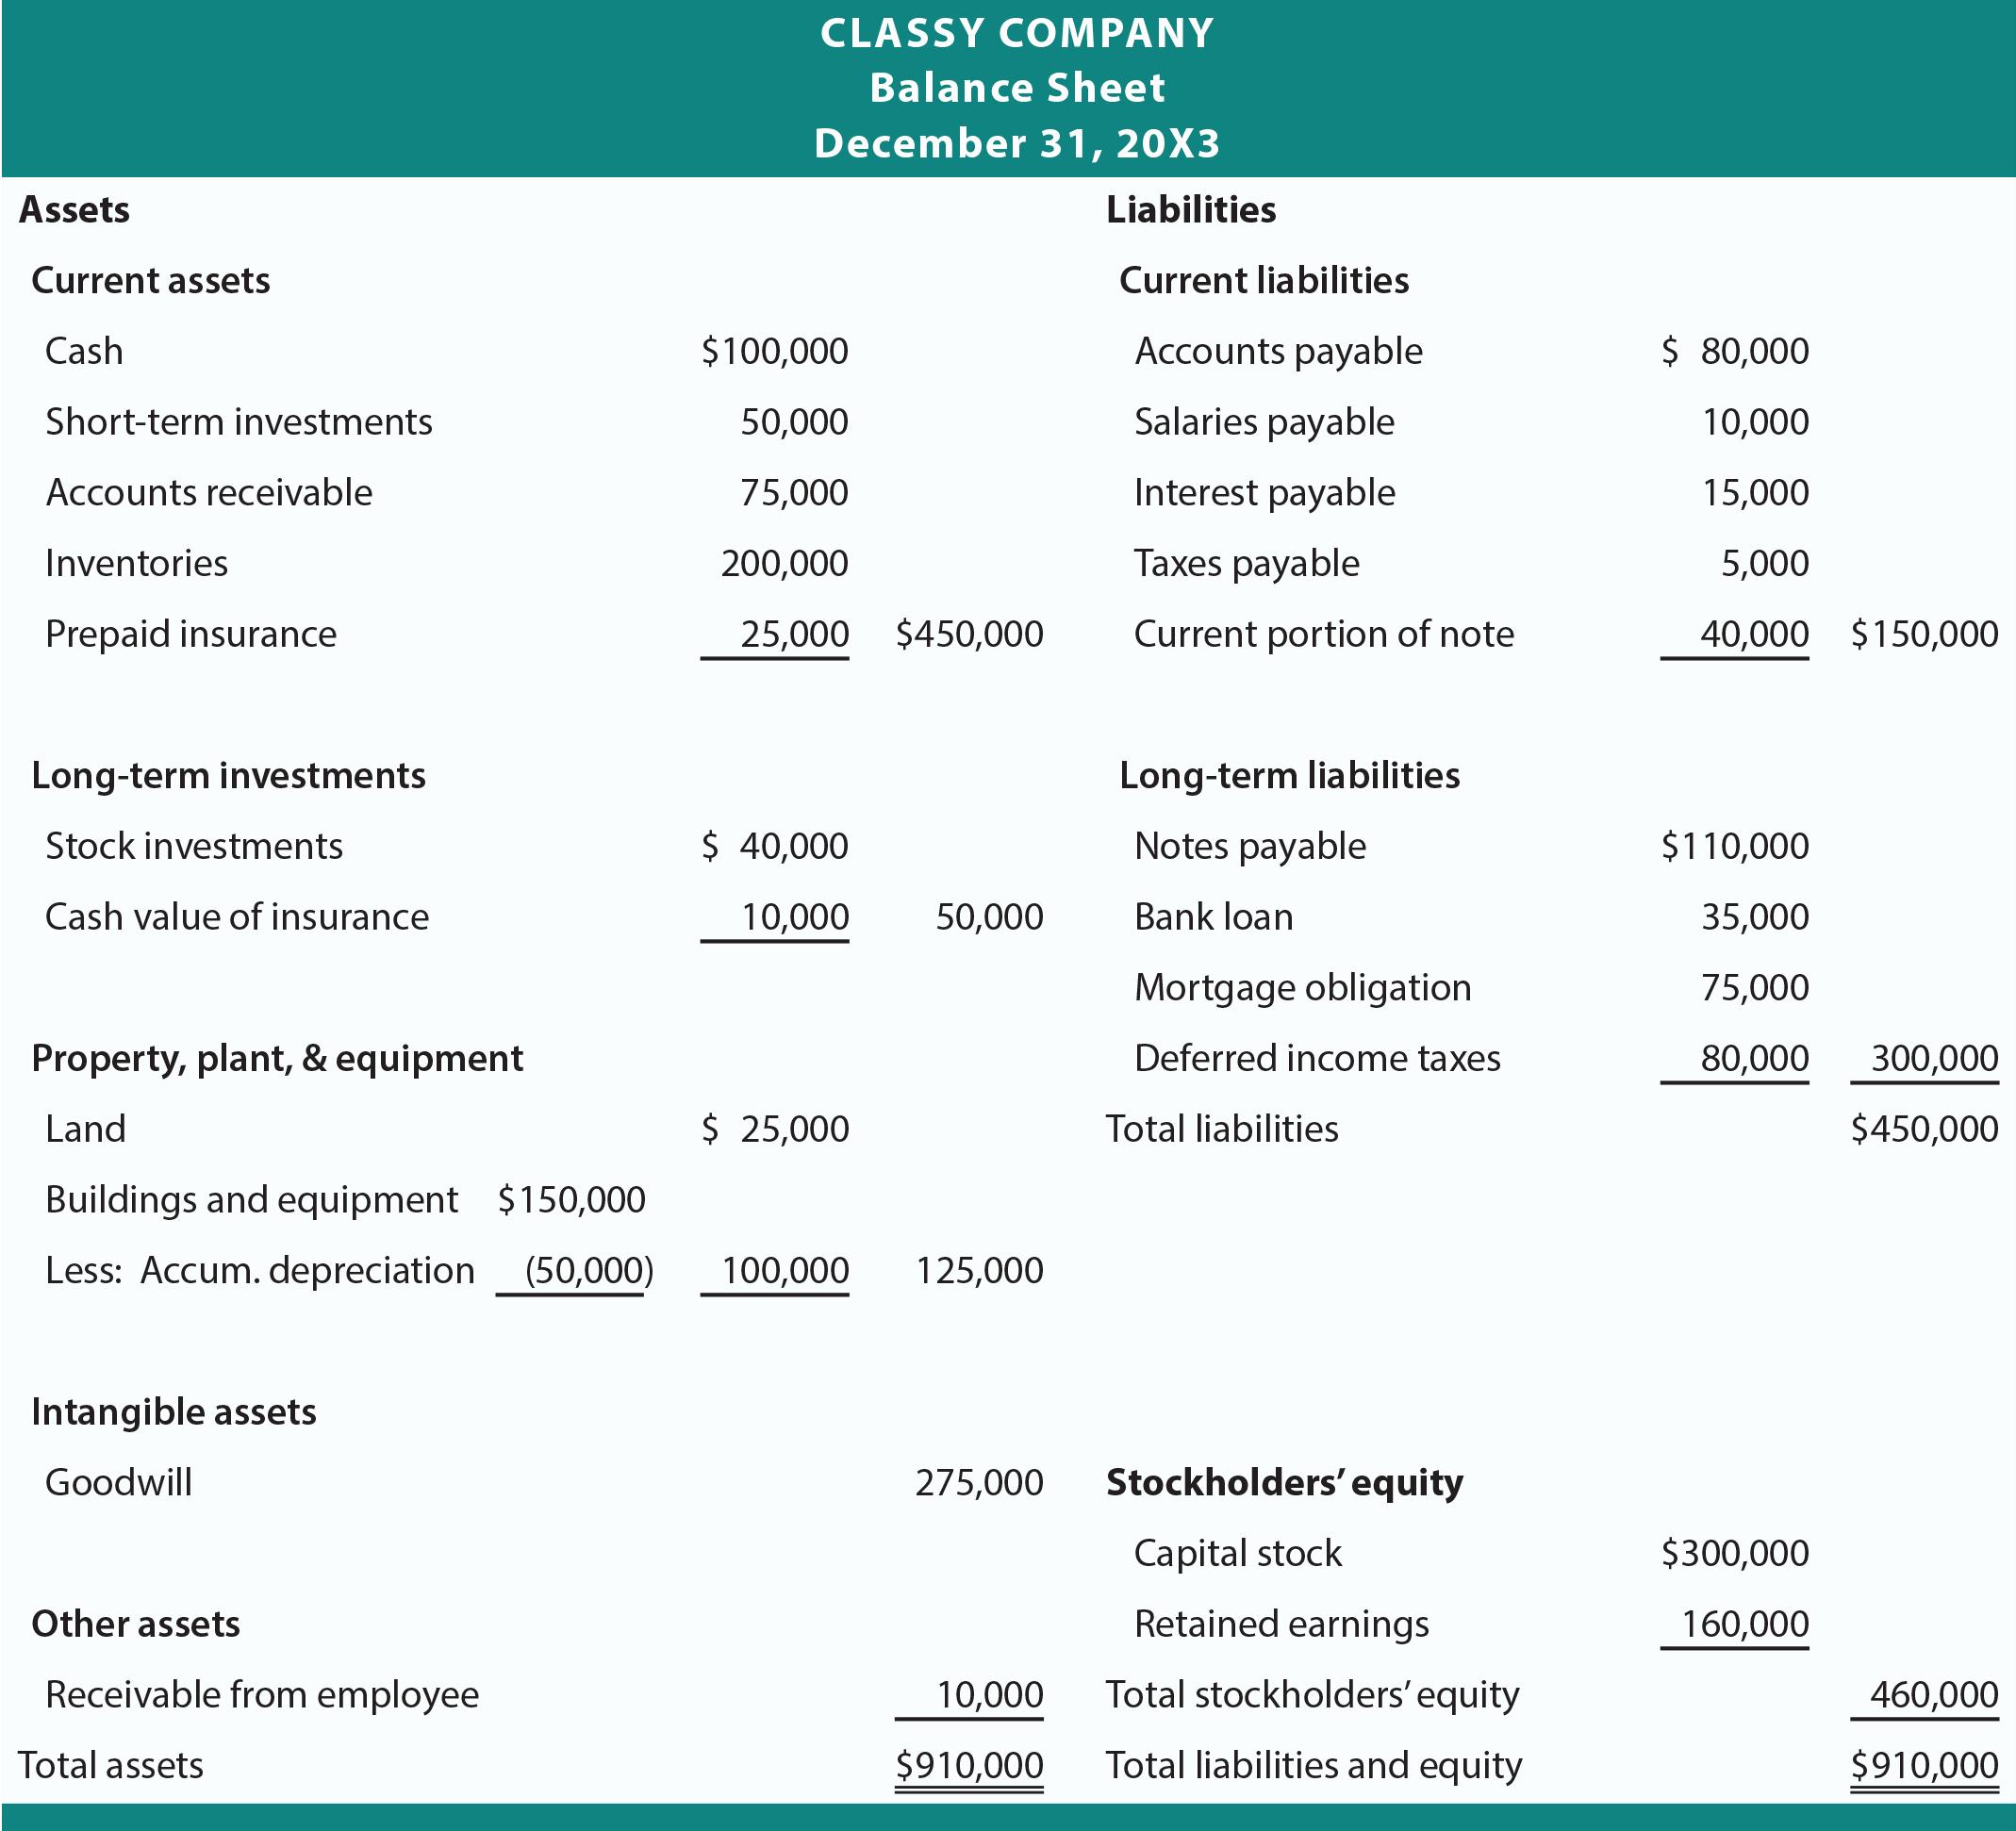 S Corp Balance Sheet Template Awesome Classified Balance Sheets Principlesofaccounting